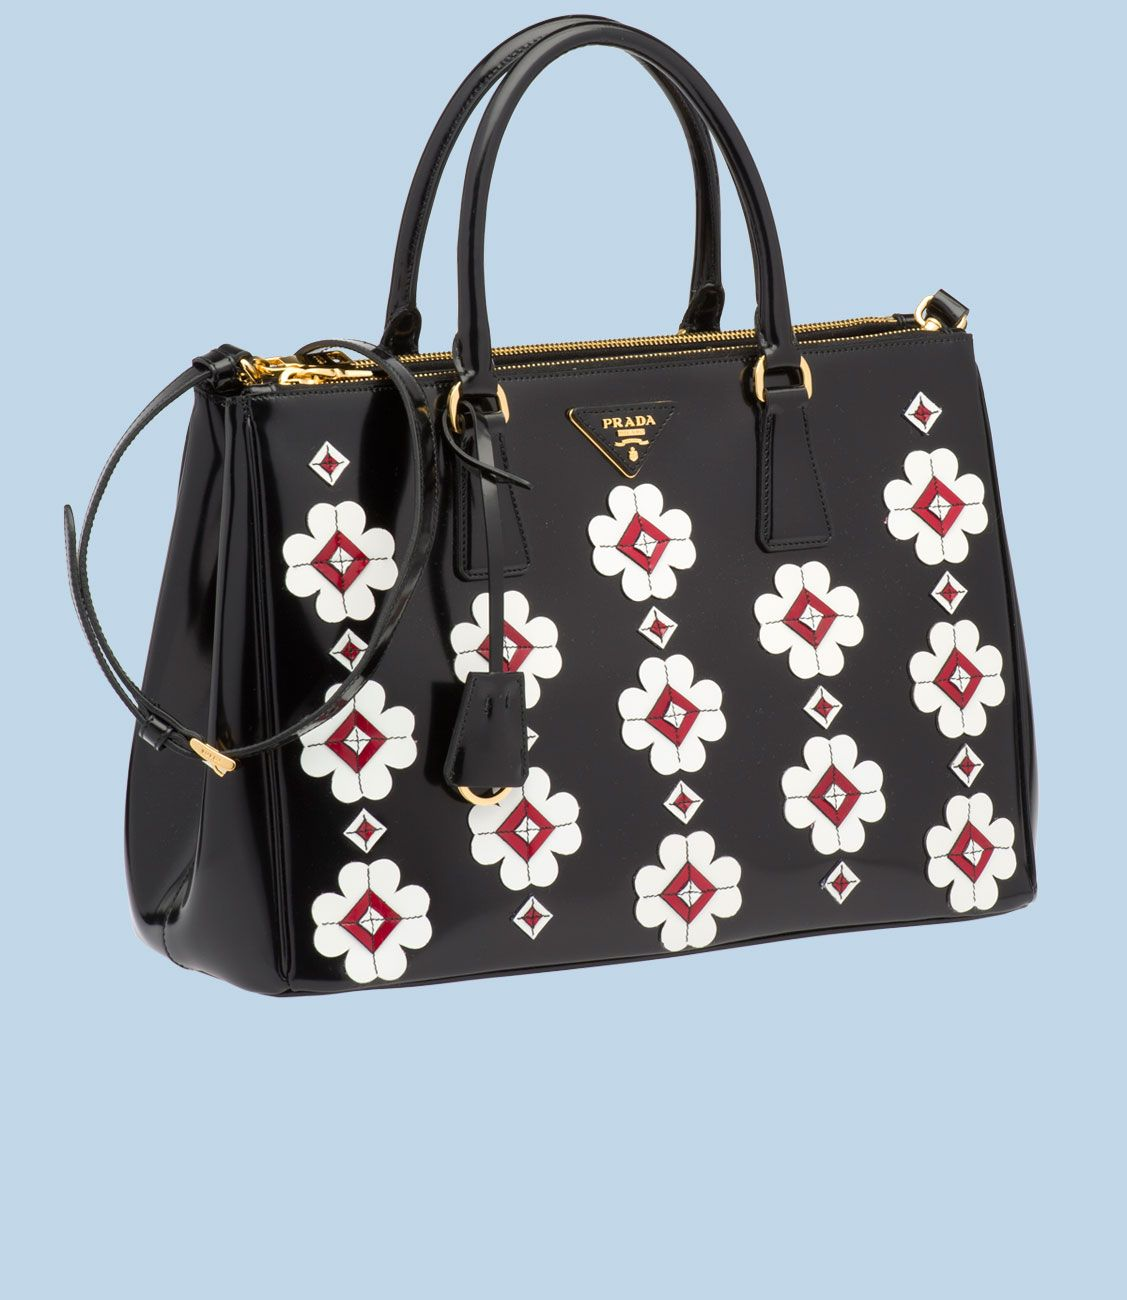 11c9eae4db5 Prada-flowers-brushed-calf-leather-tote-1.jpg 1